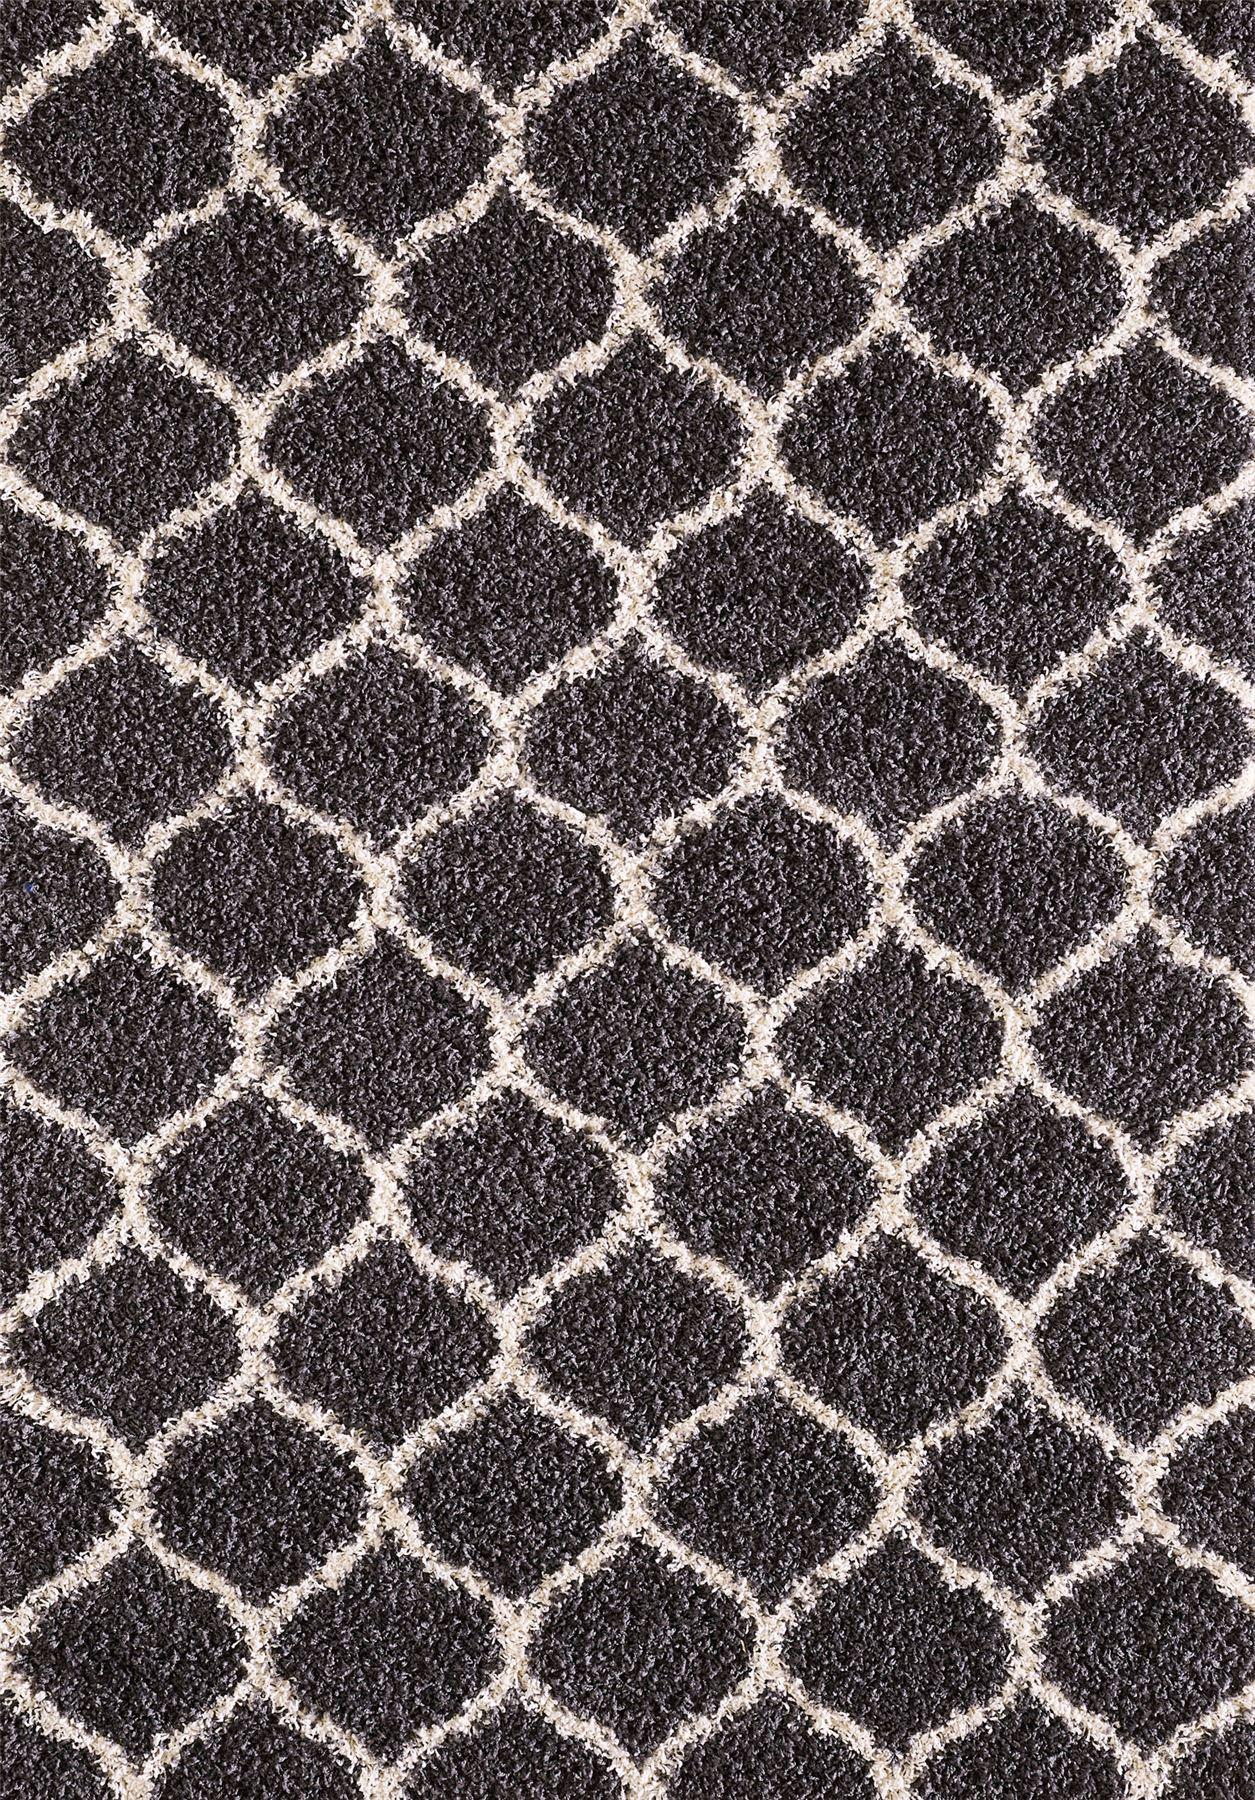 Large Modern Dark Grey Trellis Shaggy Carpet Contemporary Soft Area ... for Modern Black Carpet Texture  557yll